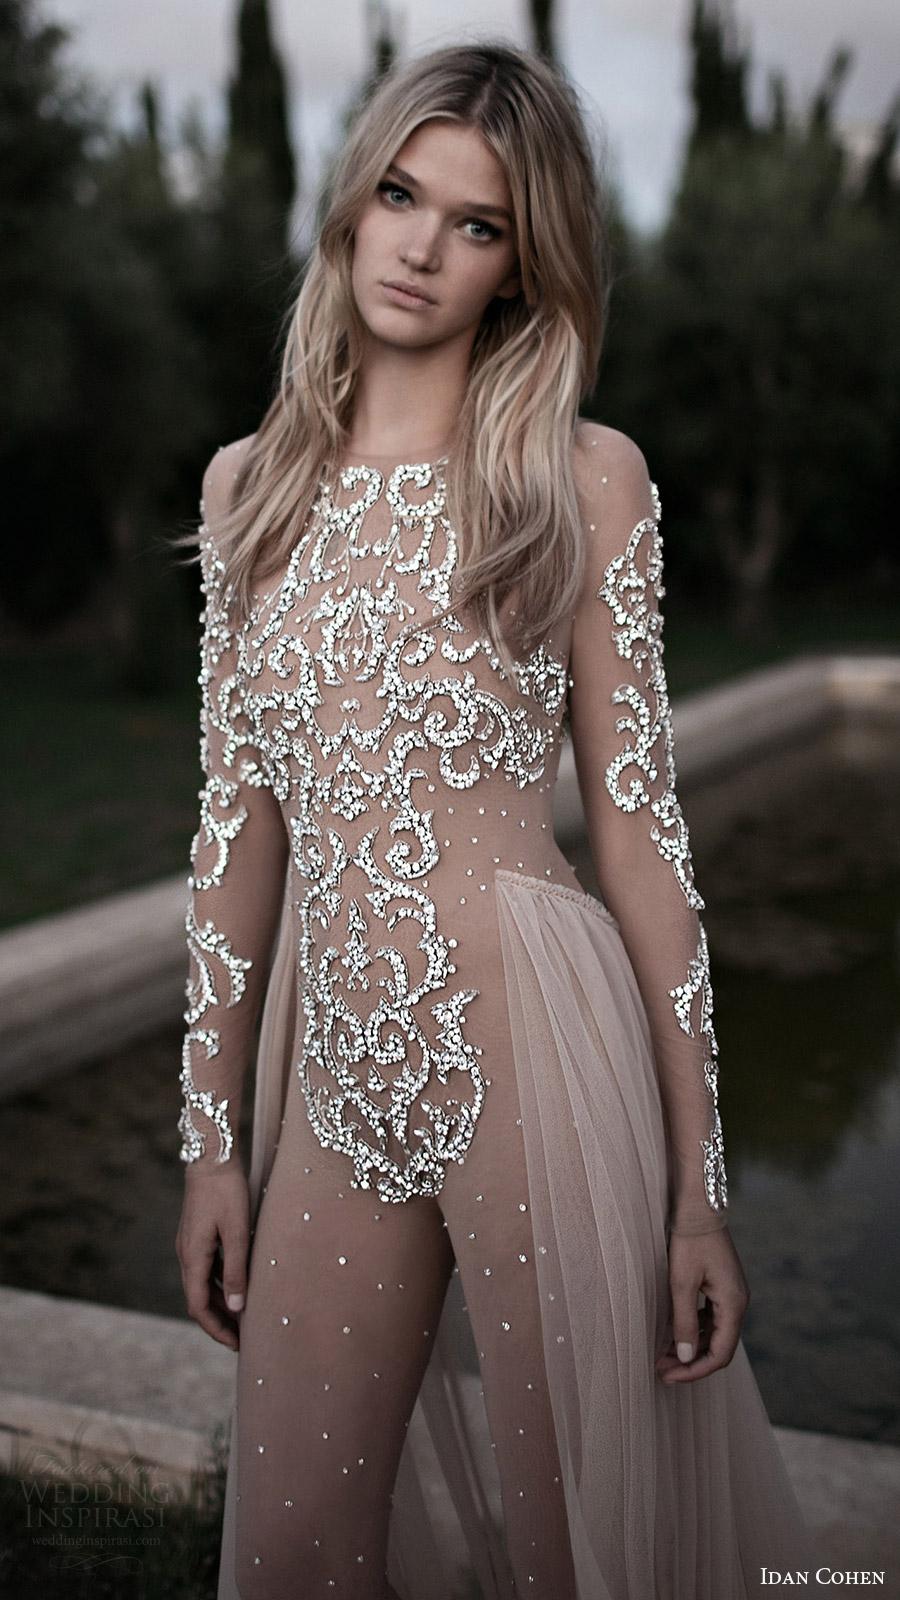 Idan Cohen de novia 2017 de la ilusión con cuentas de manga larga vestido de novia body corpiño (jennifer) mv sobrefalda